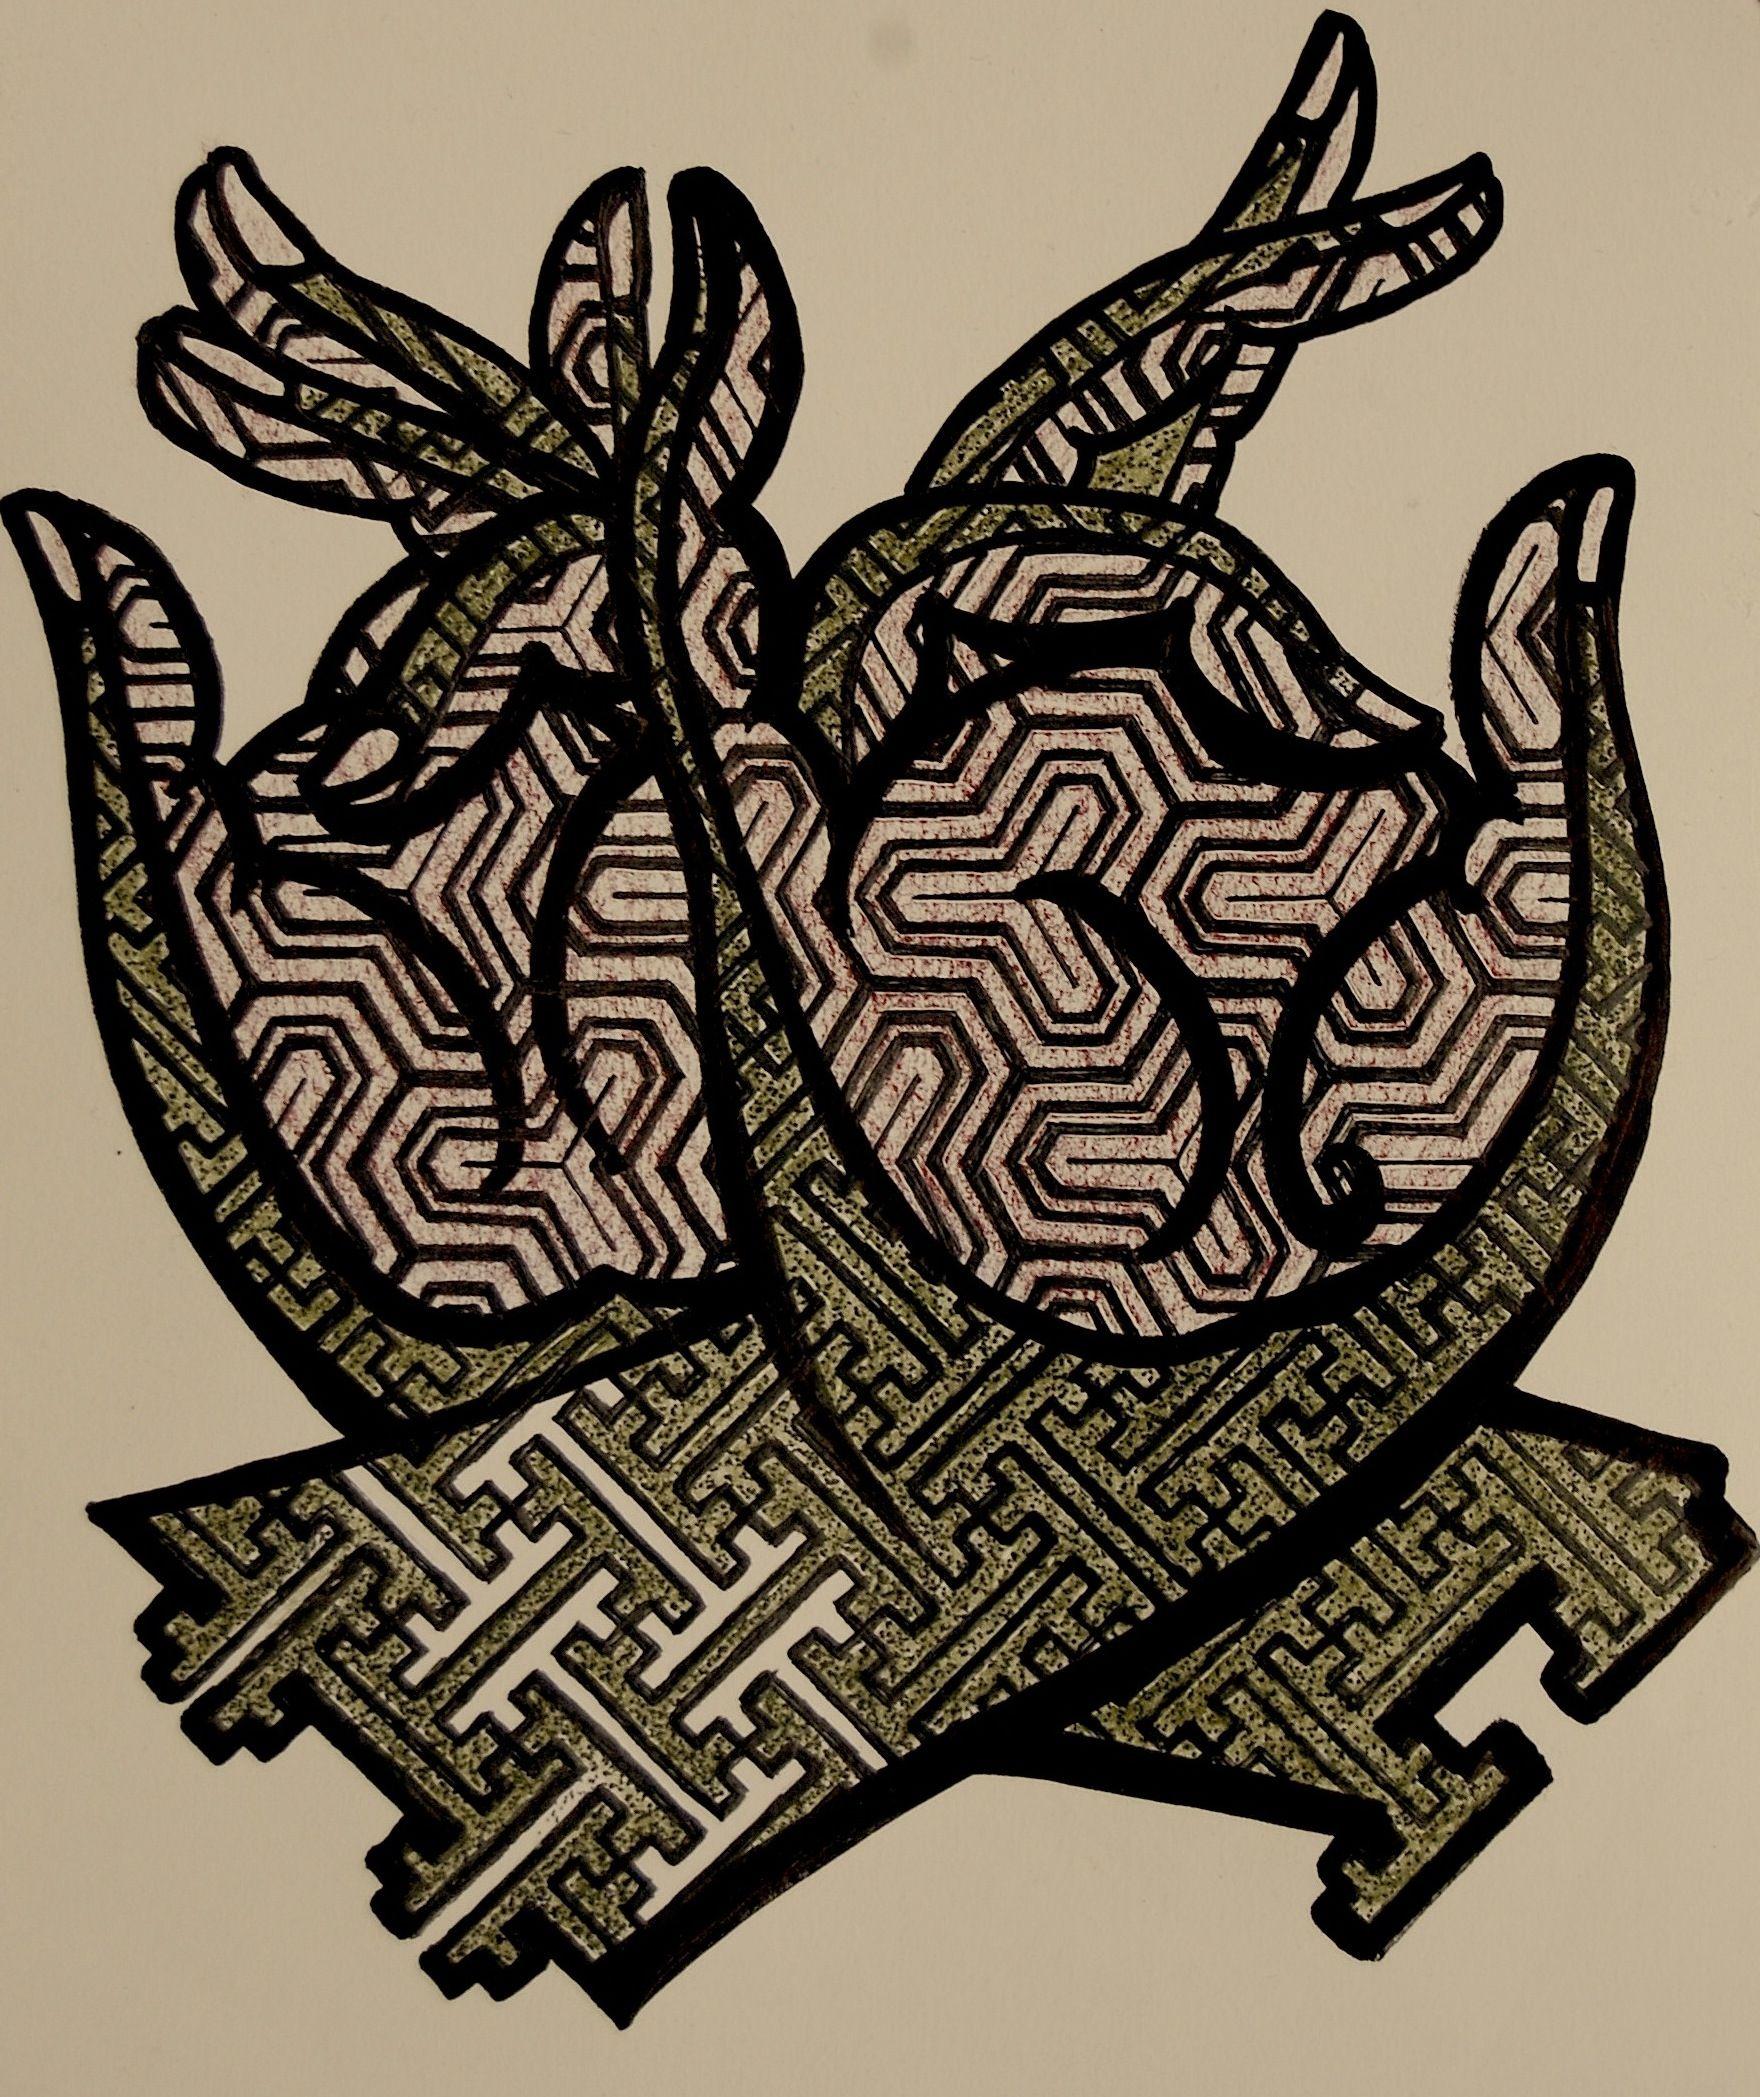 39 sacred mudra 39 tattoo design surya ink tattoo ideas at for Sacred ink tattoo